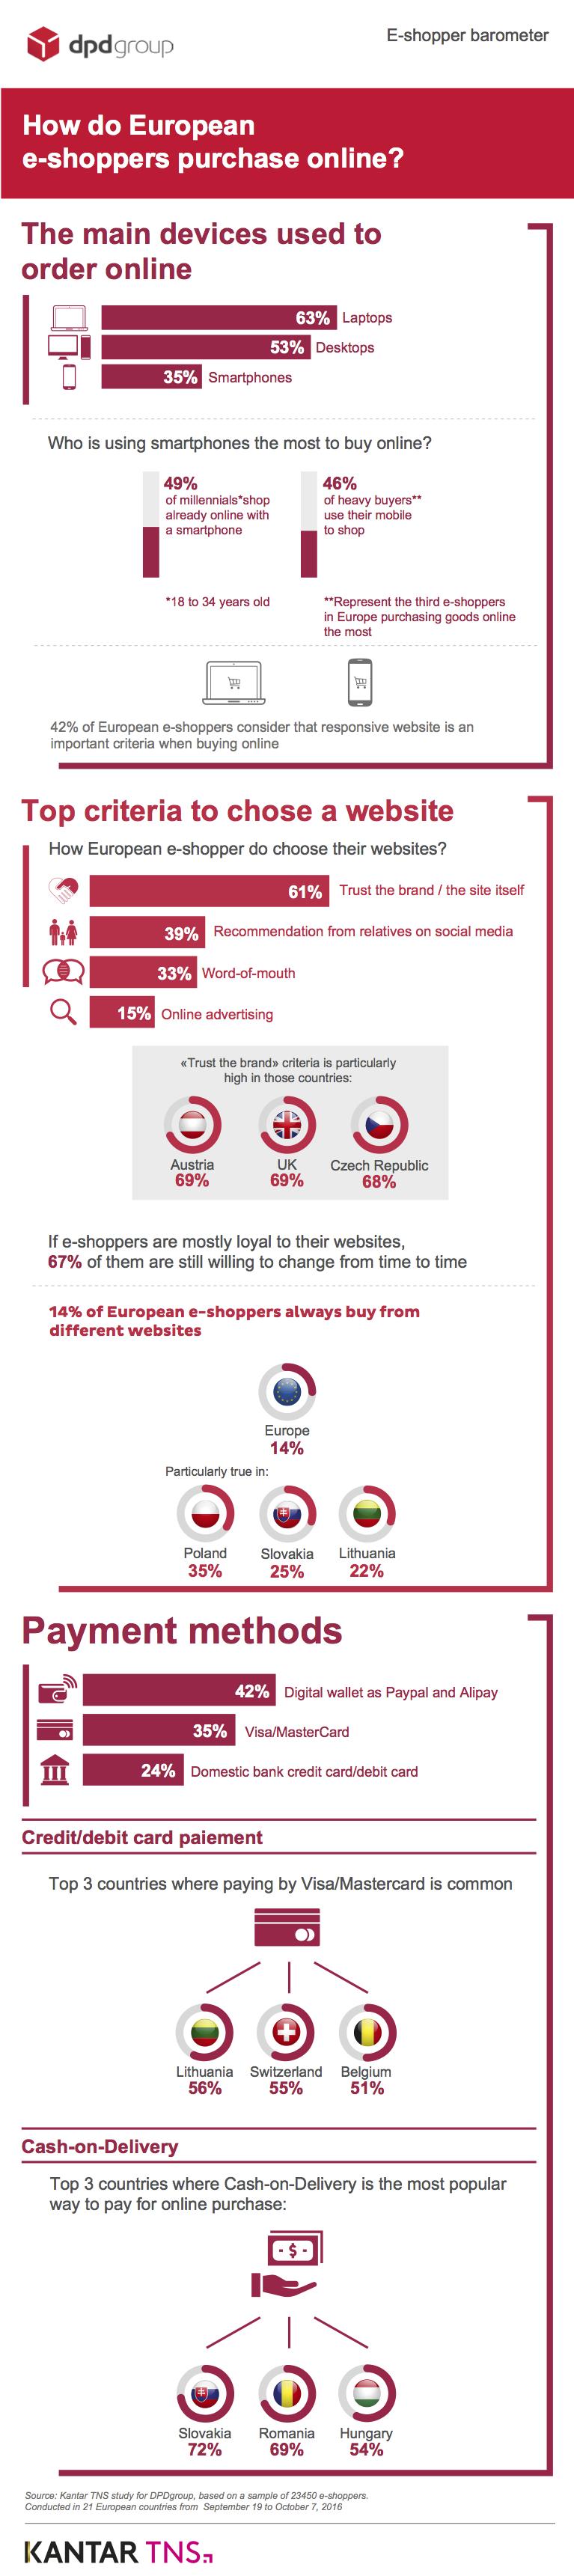 Online payment methodes cross-border